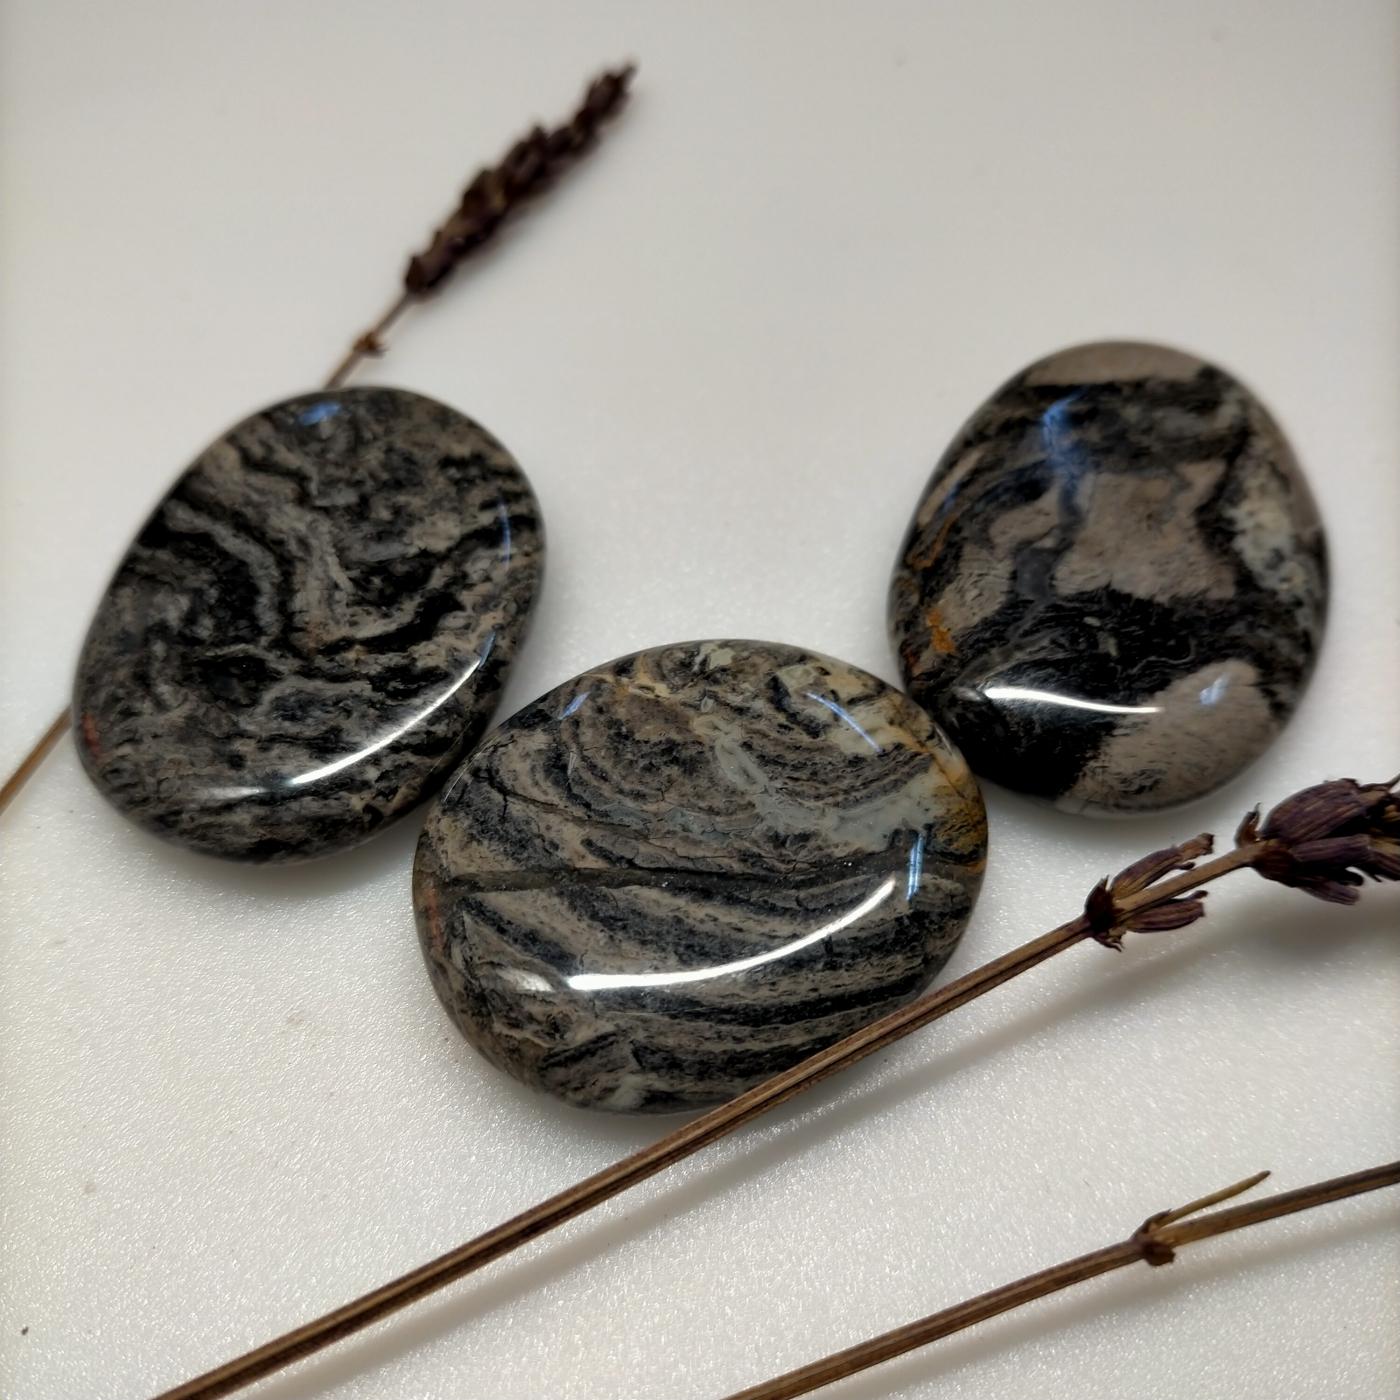 Canto rodado de jaspe hoja de plata -